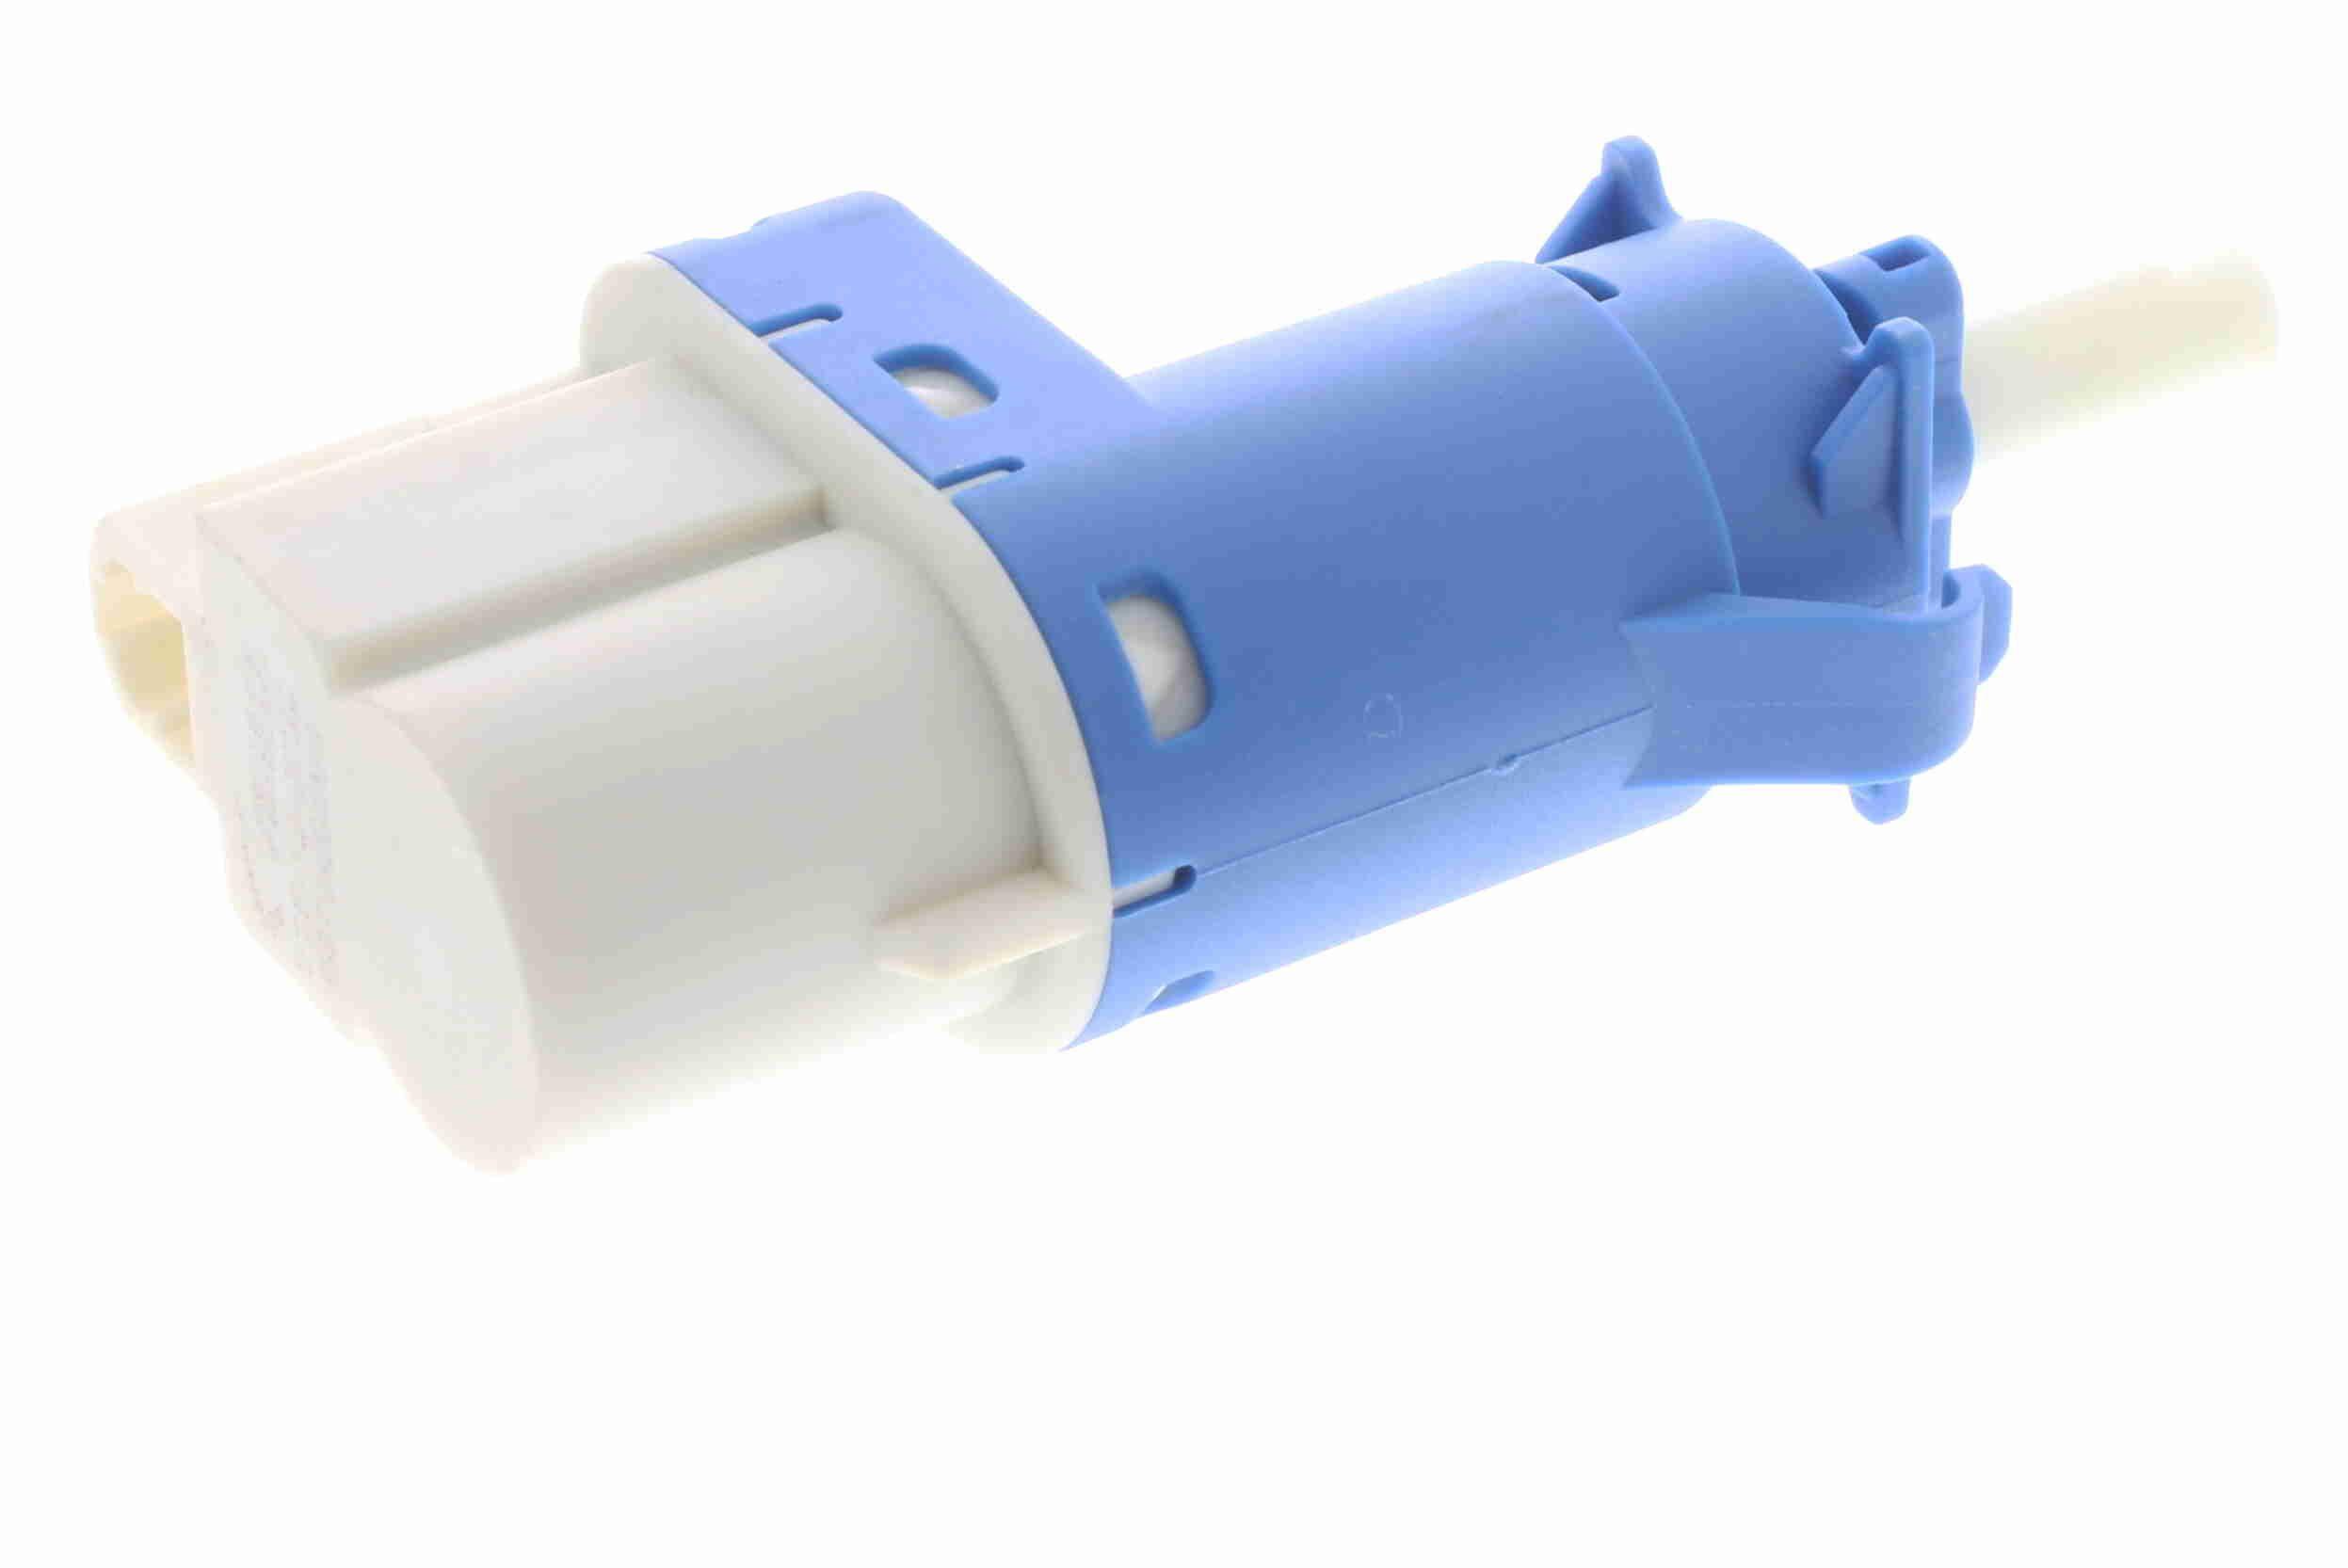 V25-73-0020 VEMO Original VEMO Quality Number of Poles: 2-pin connector Brake Light Switch V25-73-0020 cheap